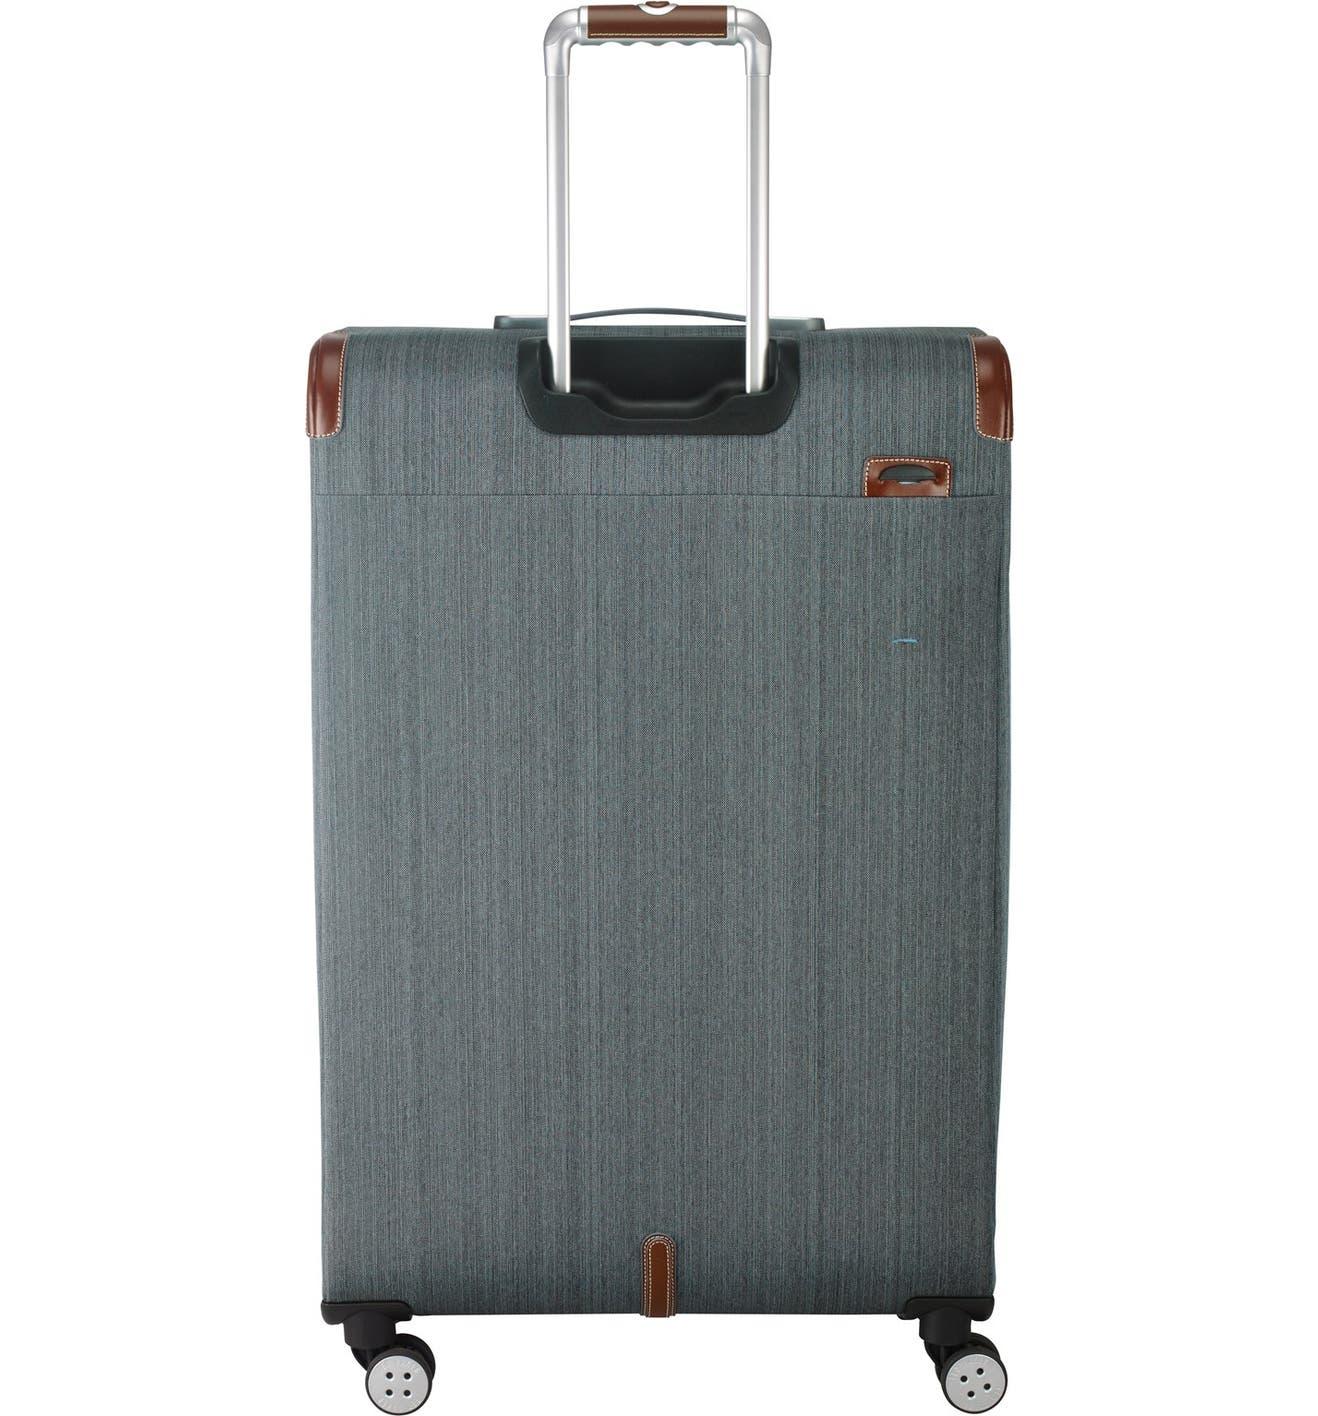 7745c42b752dc9 Ted Baker London  Large Falconwood Grey  Four Wheel Suitcase (31 Inch)